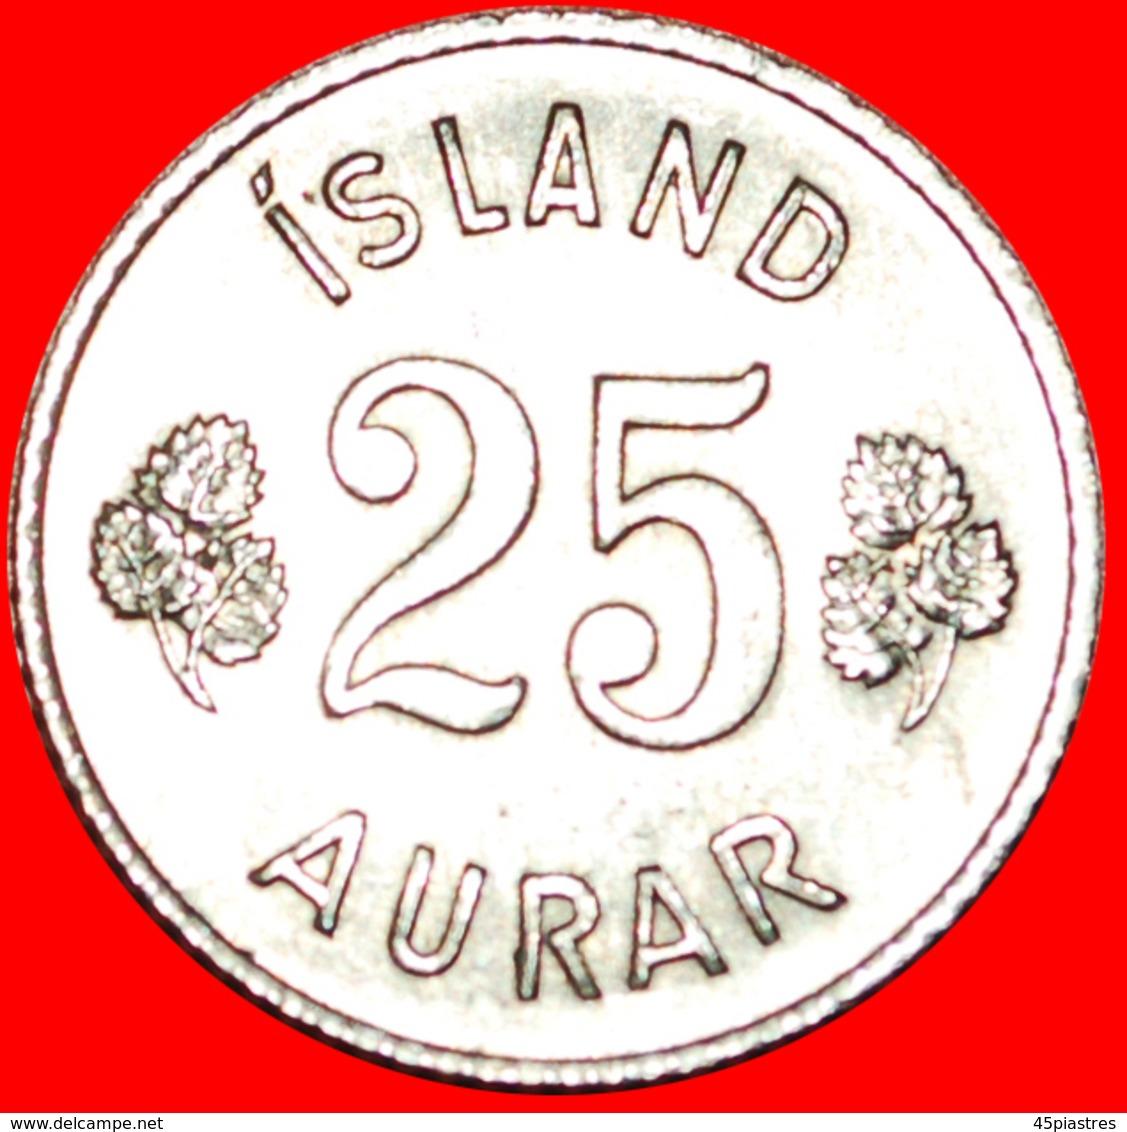 + GREAT BRITAIN BIRCH (1946-1967): ICELAND ★ 25 ORE 1967 MINT LUSTER! LOW START ★ NO RESERVE! - Islandia